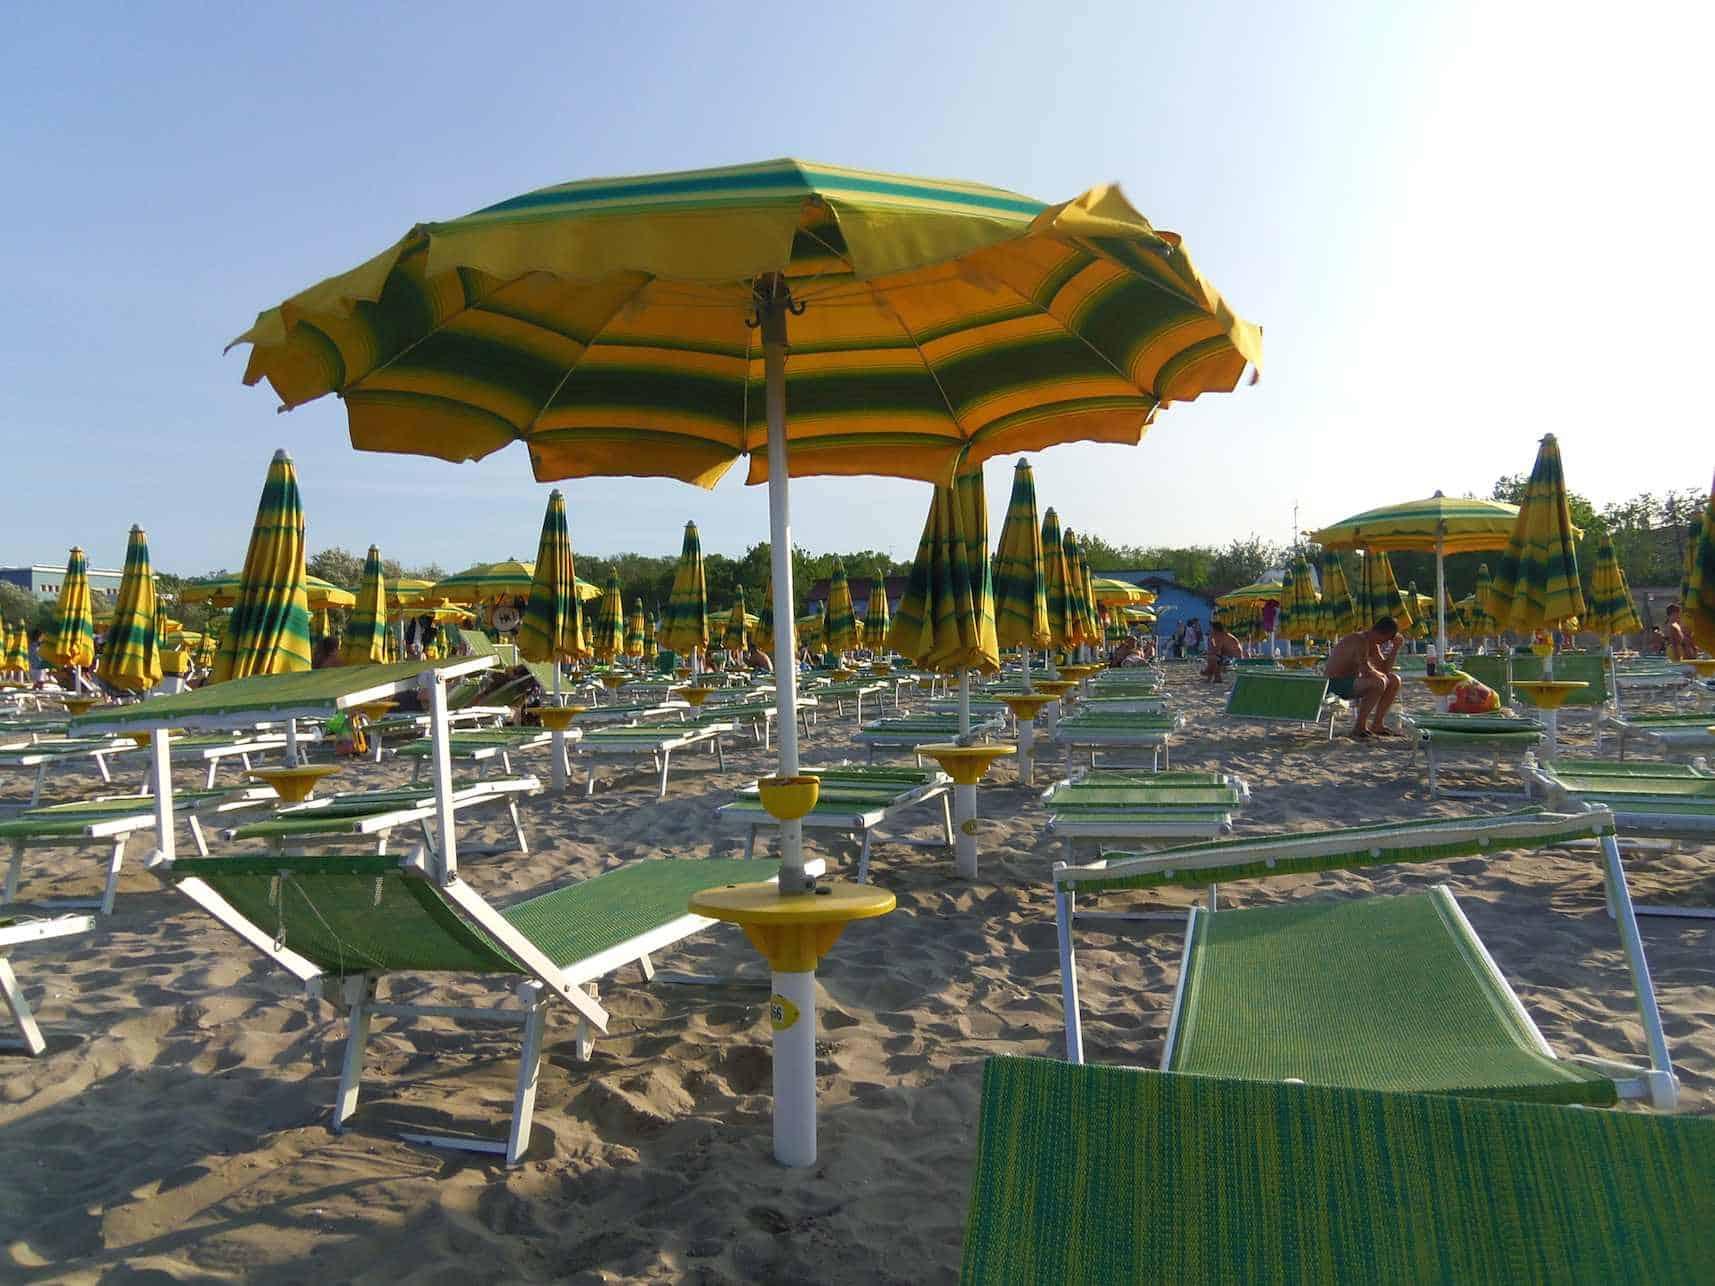 Beach of the camping (c) Srsck